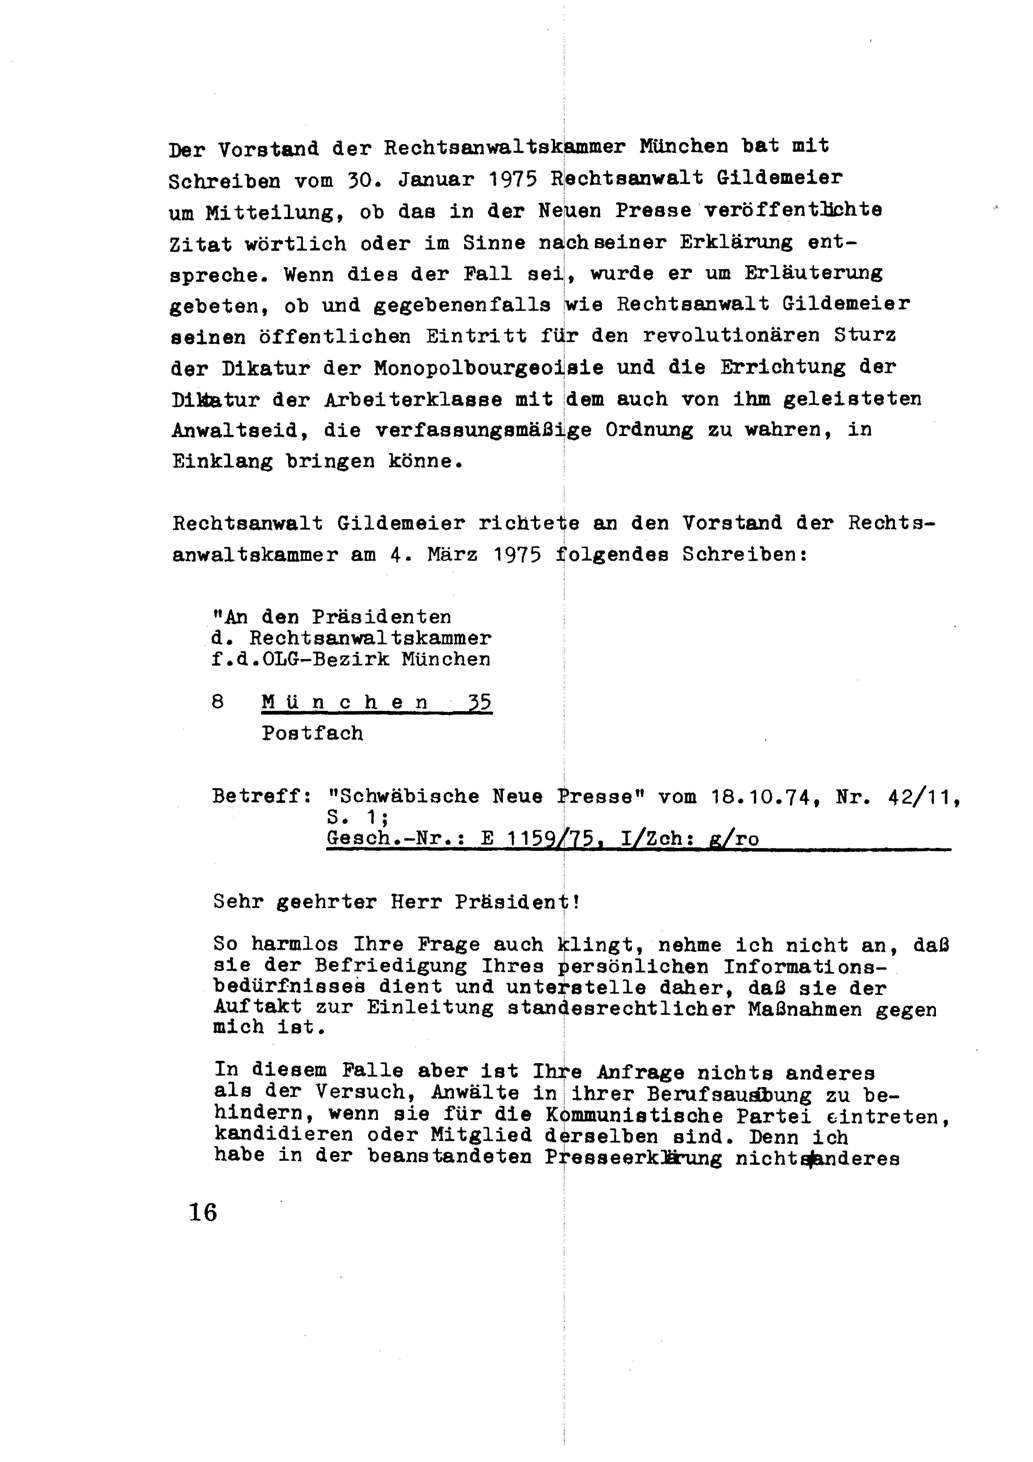 RHeV_Anschuldigung_RA_Gildemeier_Seite_16